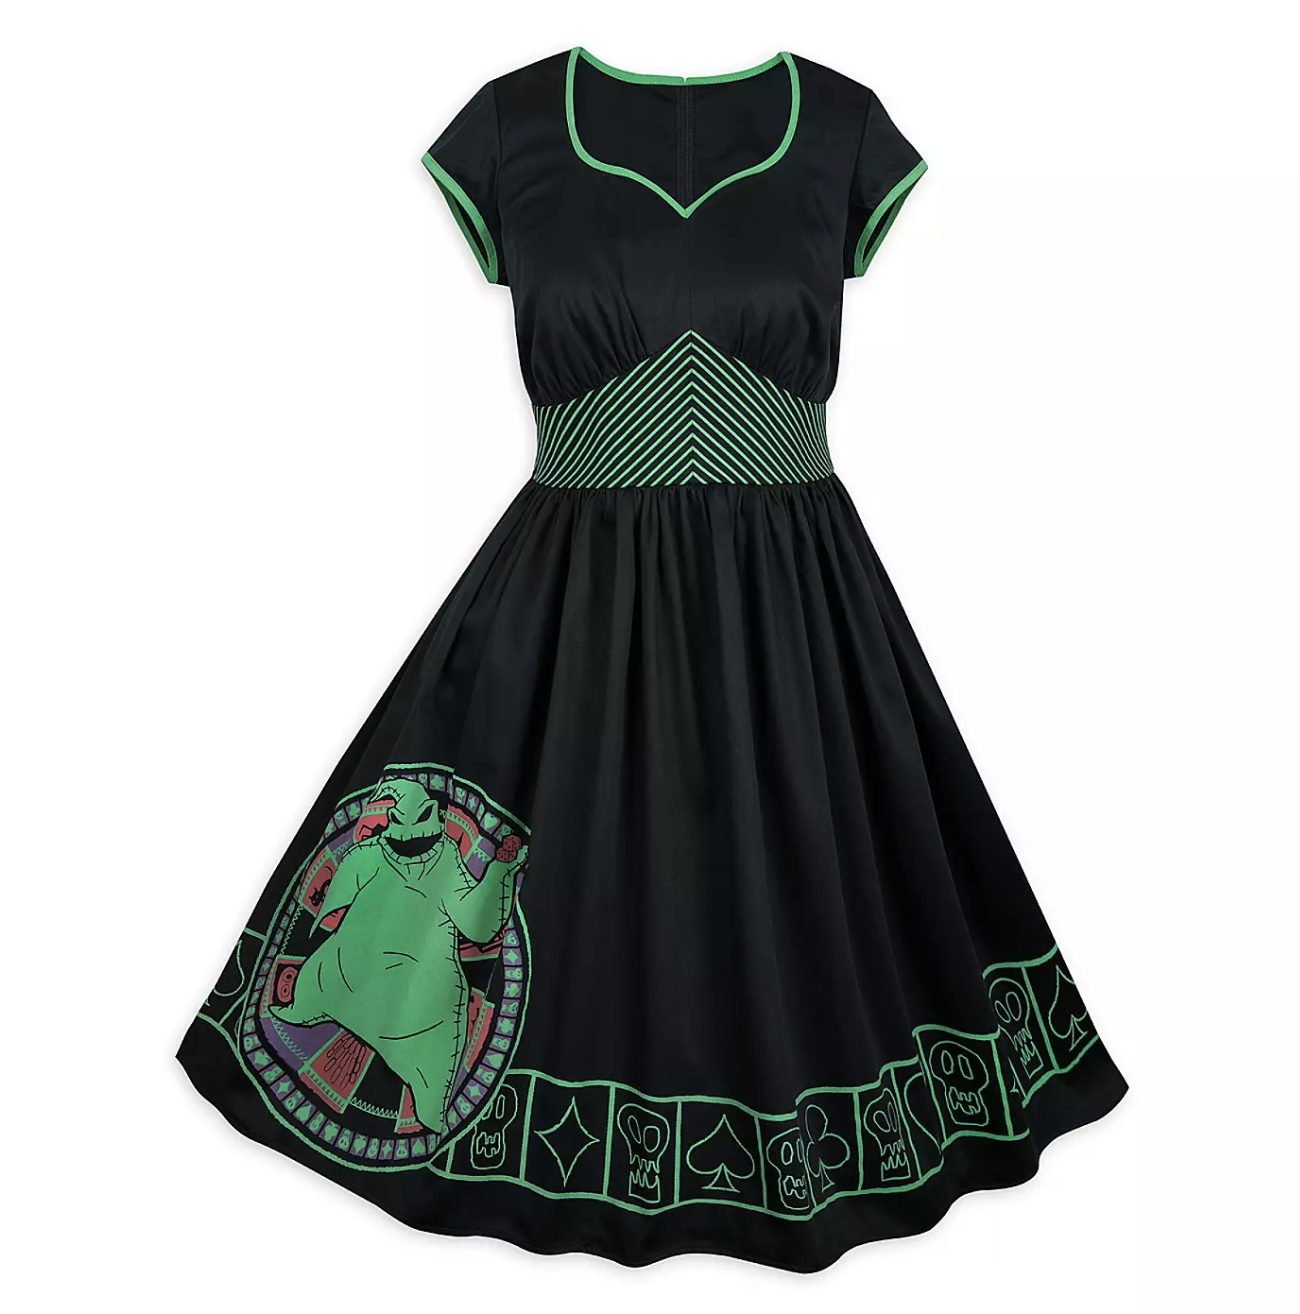 Disney Running Foolish Mortal Pattern Dress Disney Dresses for Women Magic Kingdom Dress Haunted Mansion Costume Disney Halloween Dress